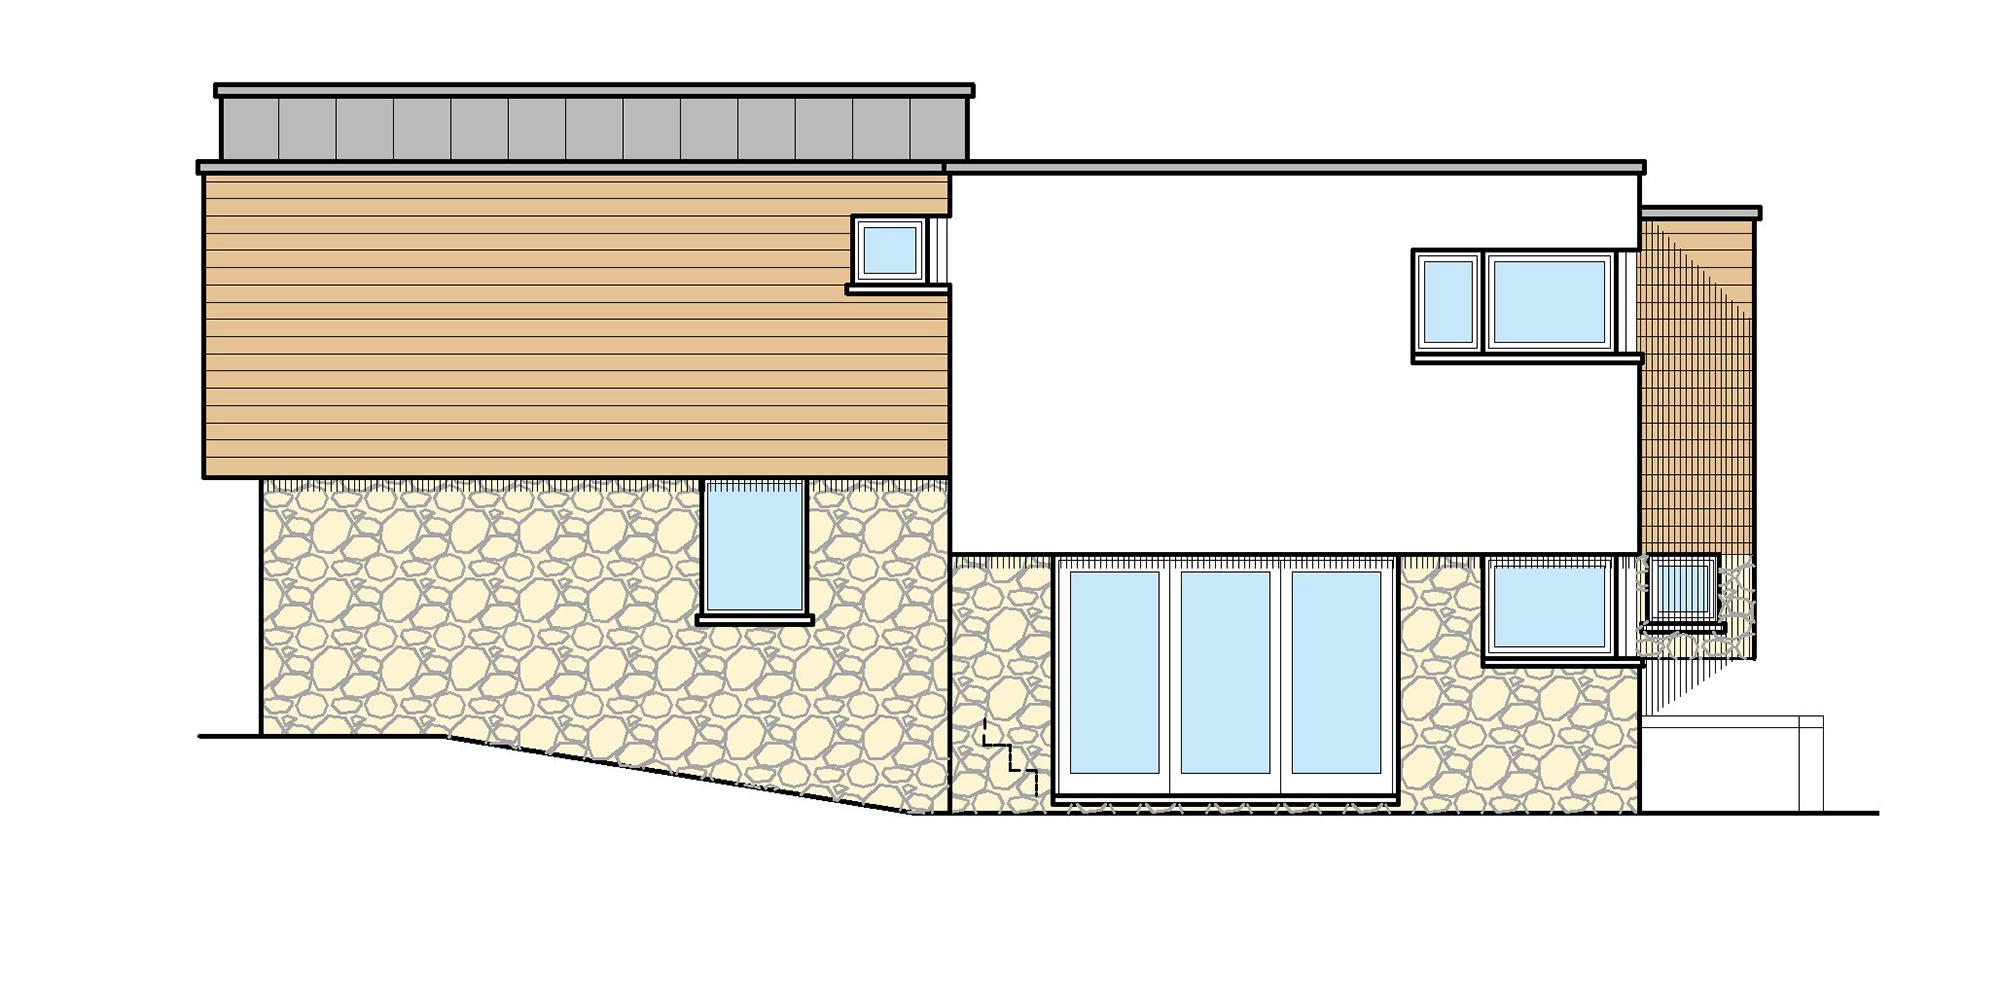 Design house uk ltd 28 images design house uk ltd for Design house architecture ltd